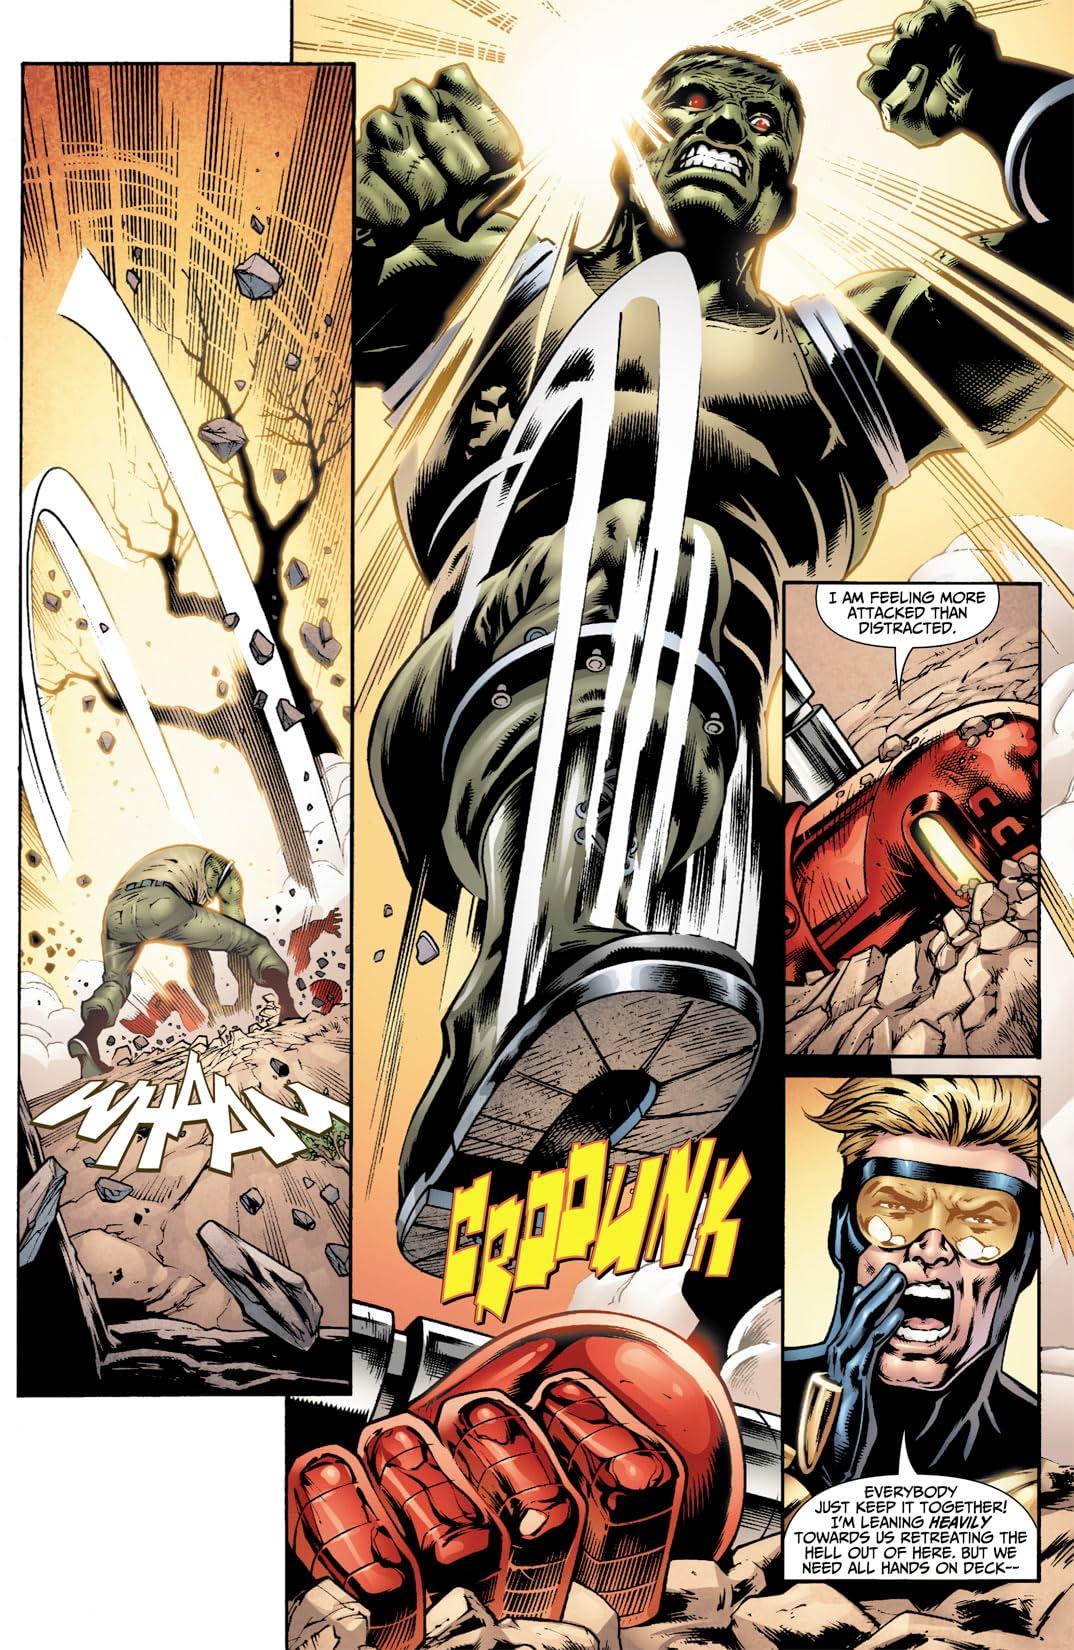 Justice League: Generation Lost #16